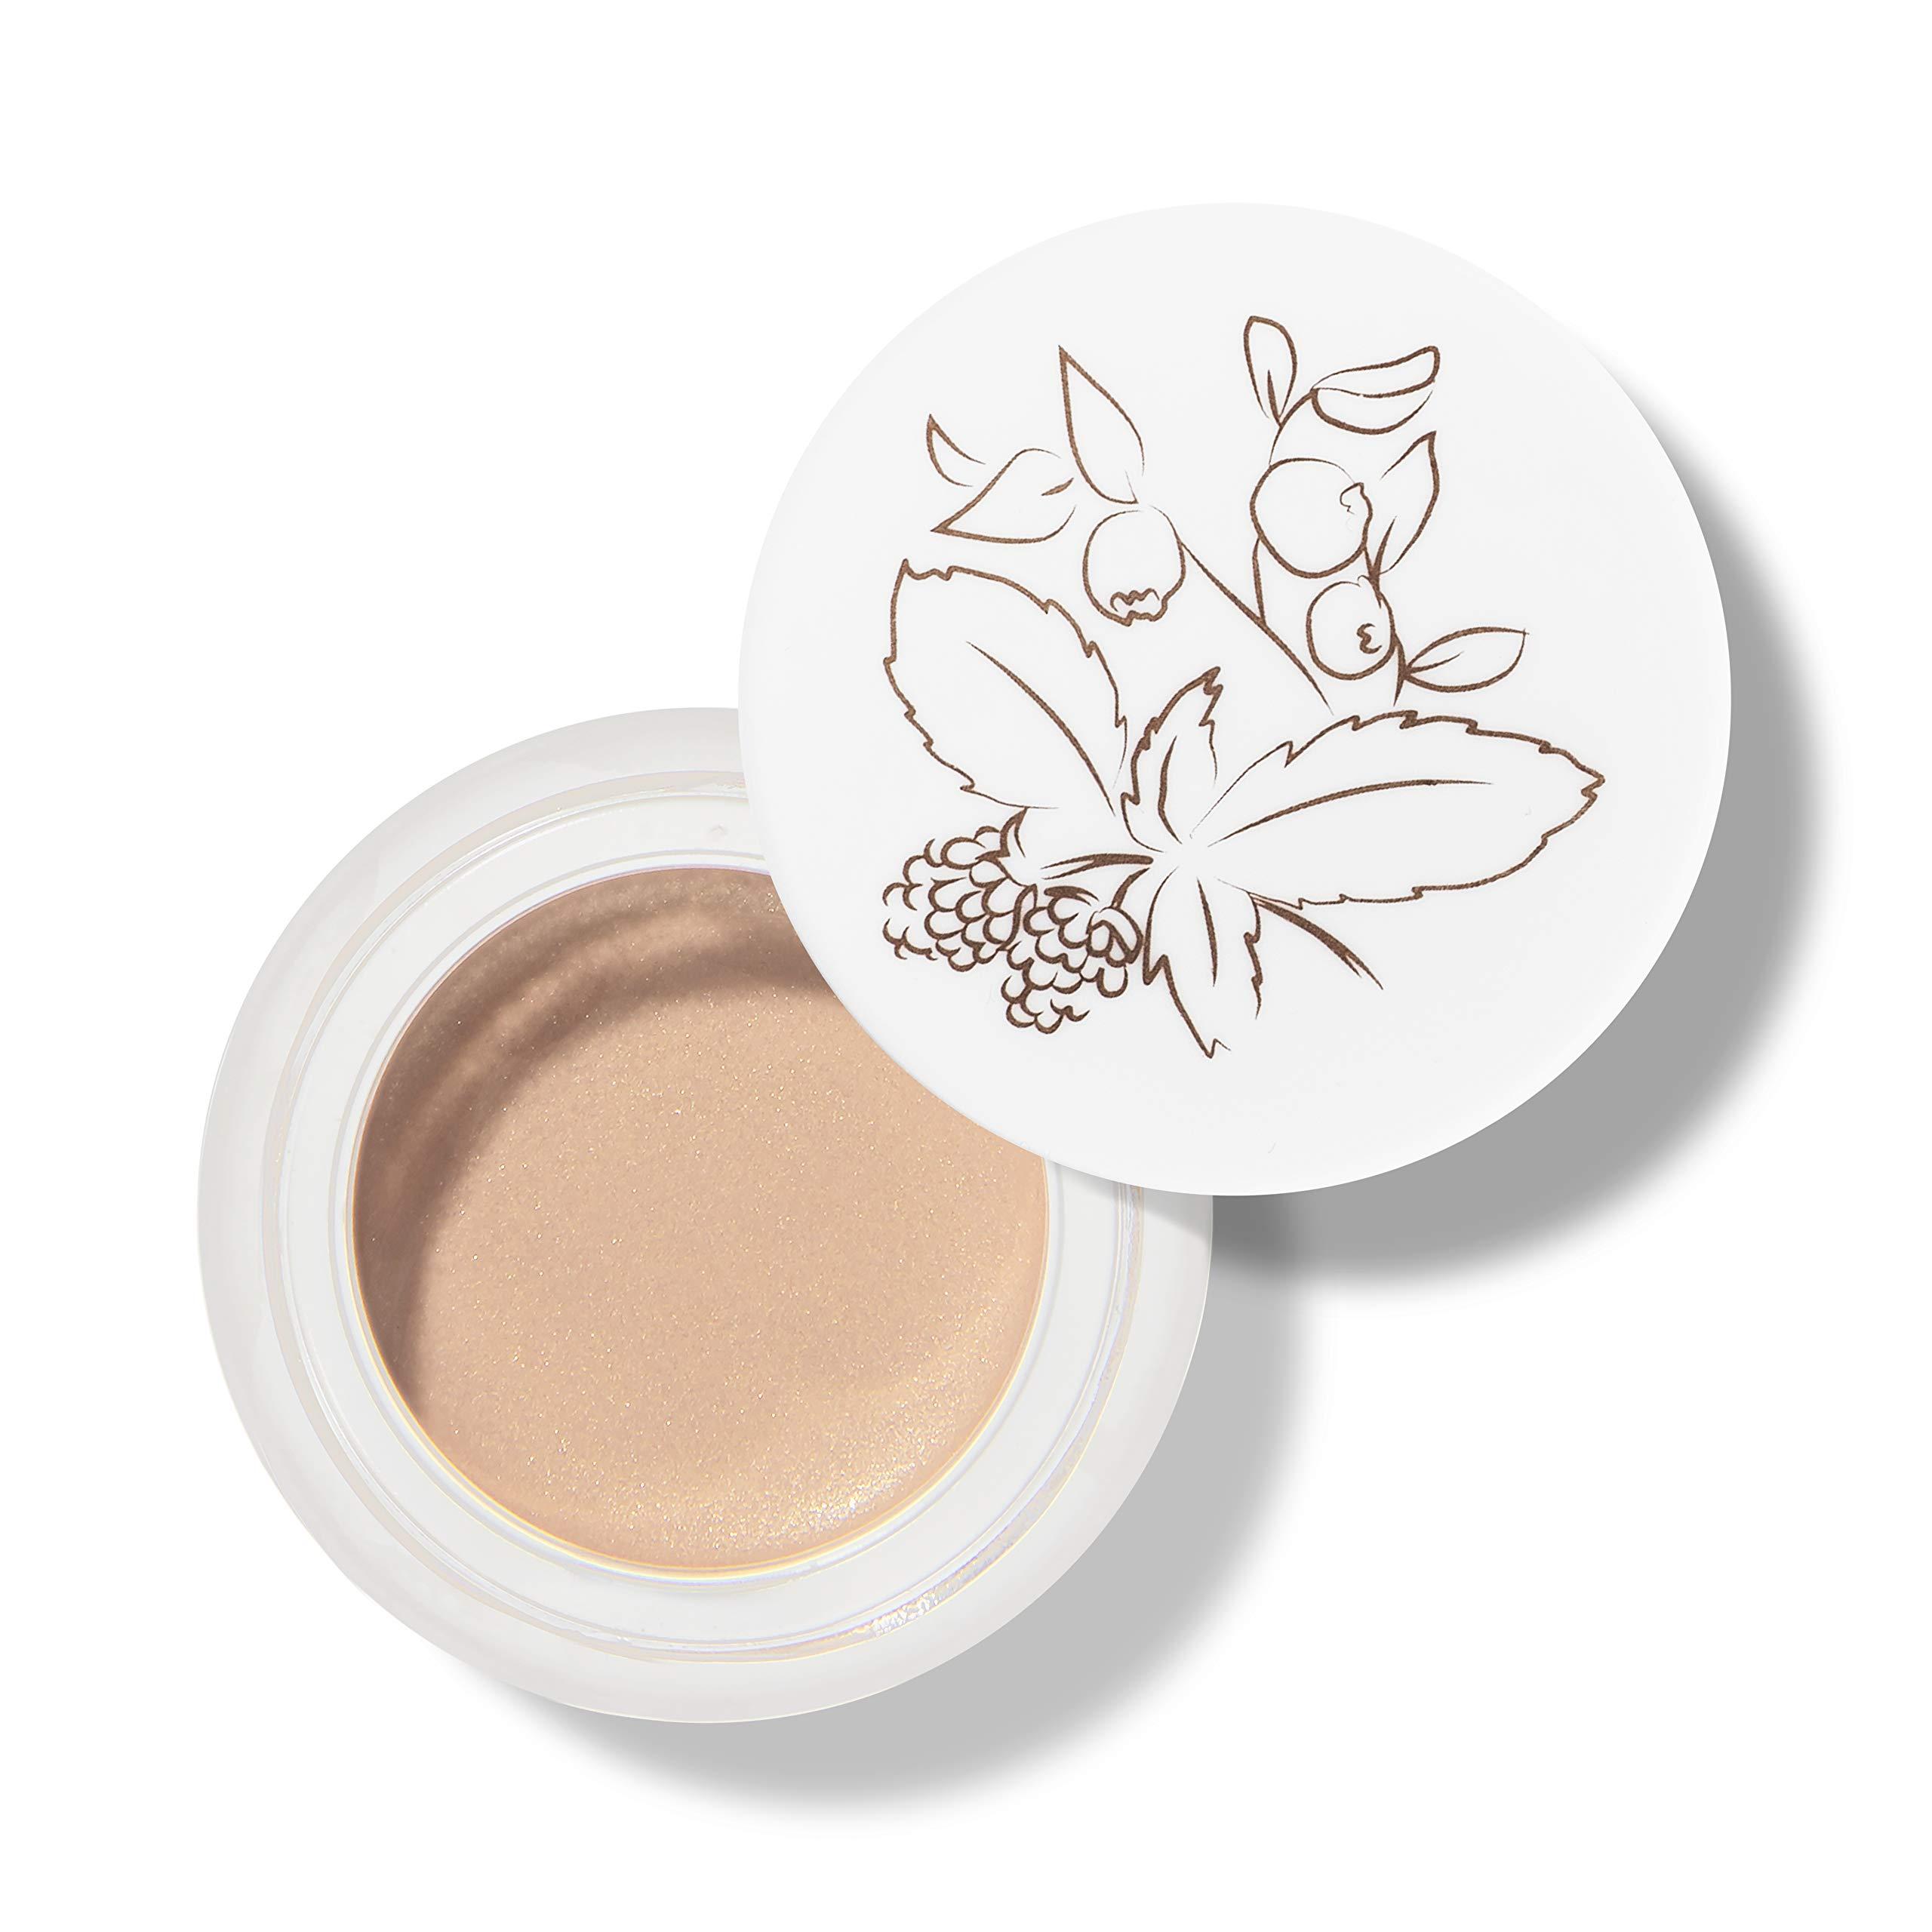 100% PURE Satin Eye Shadow (Fruit Pigmented), Tahiti, Cream Eyeshadow, Shimmer, Long Lasting Eye Makeup, Vegan, Natural Makeup (Warm, Peach Sheen) - 0.17 Oz